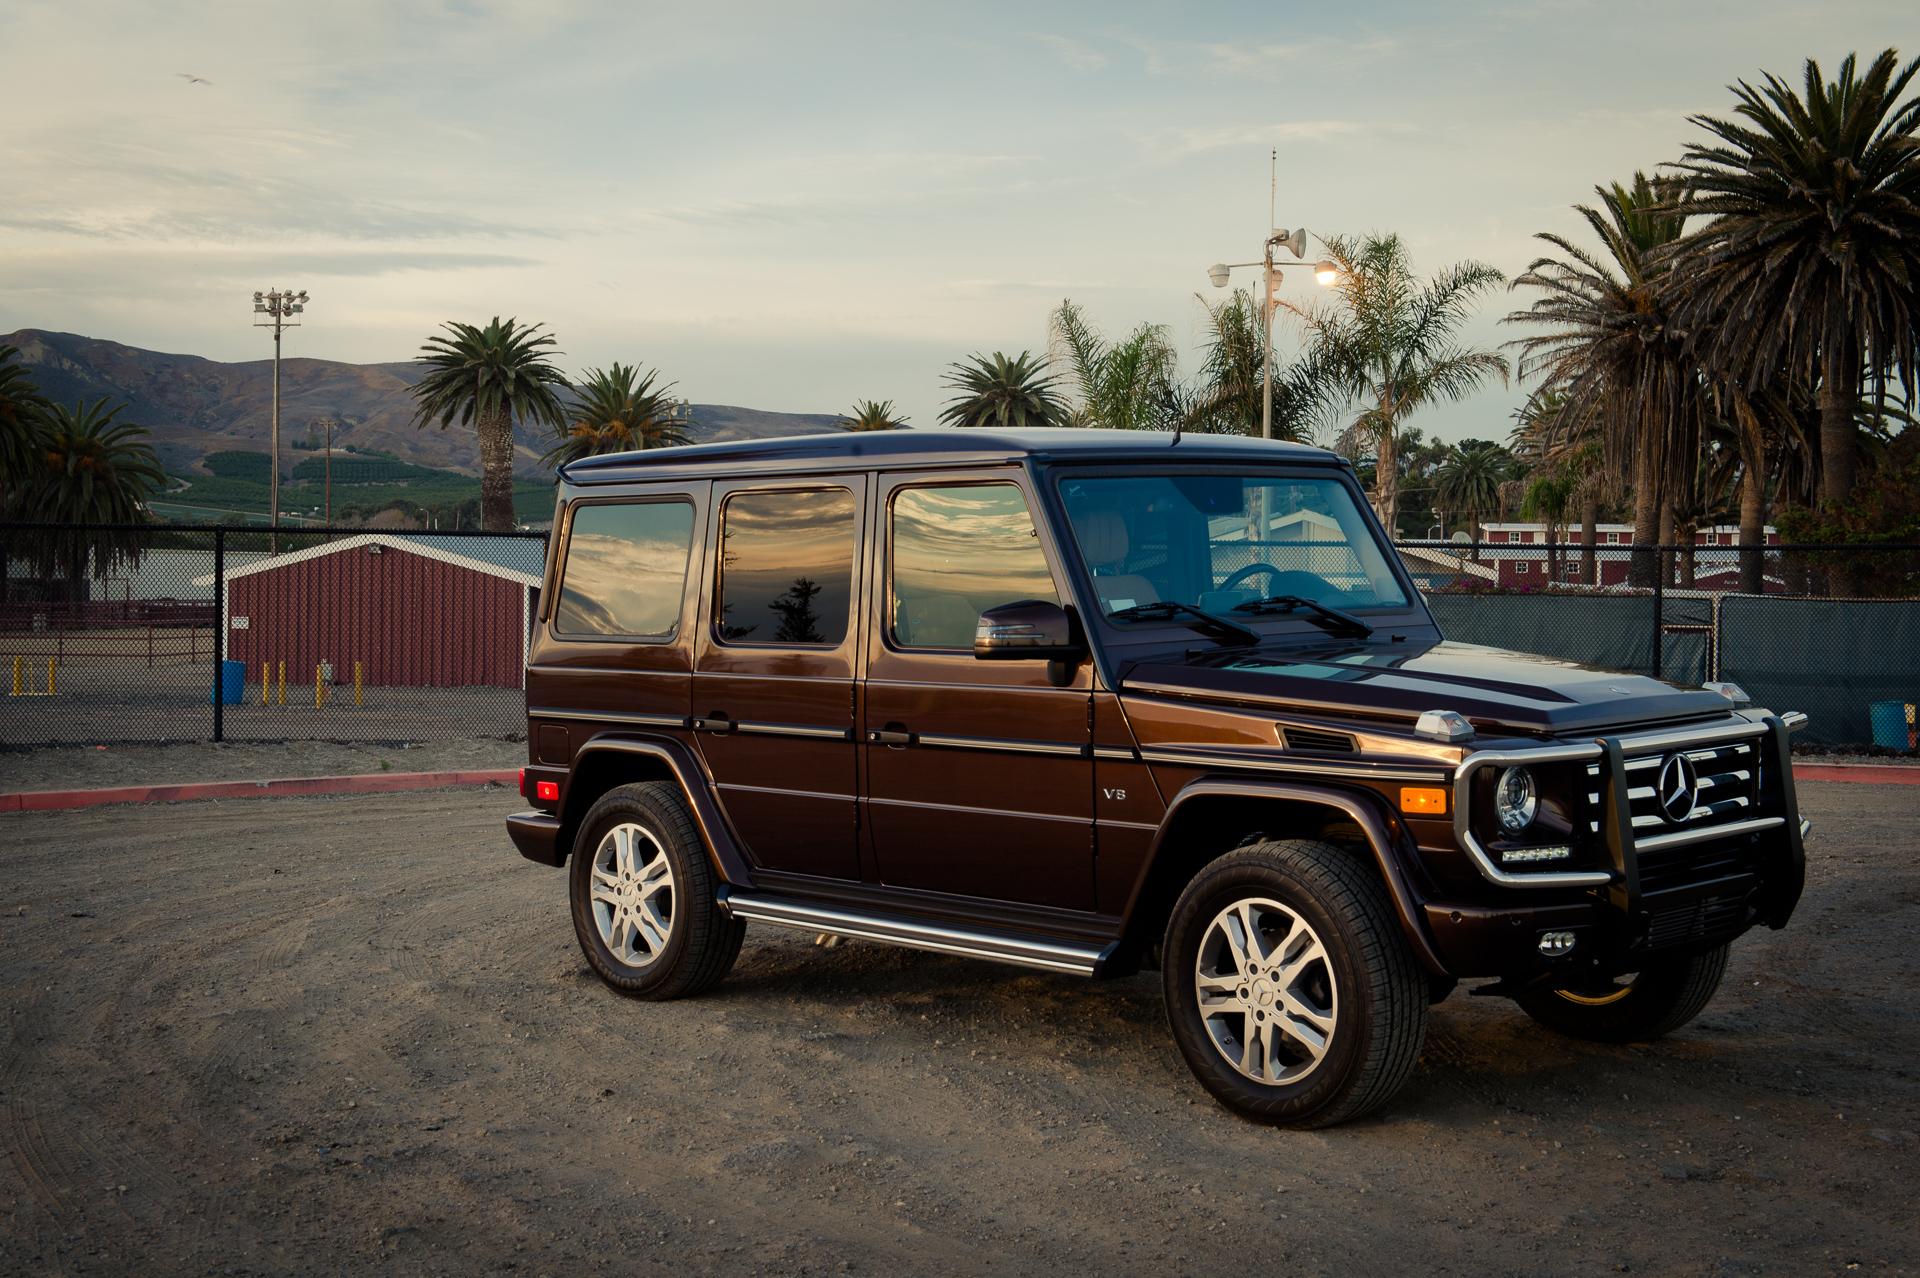 2014-Mercedes-Benz-G500-G550-braun-Kalifornien-mbrt14-47